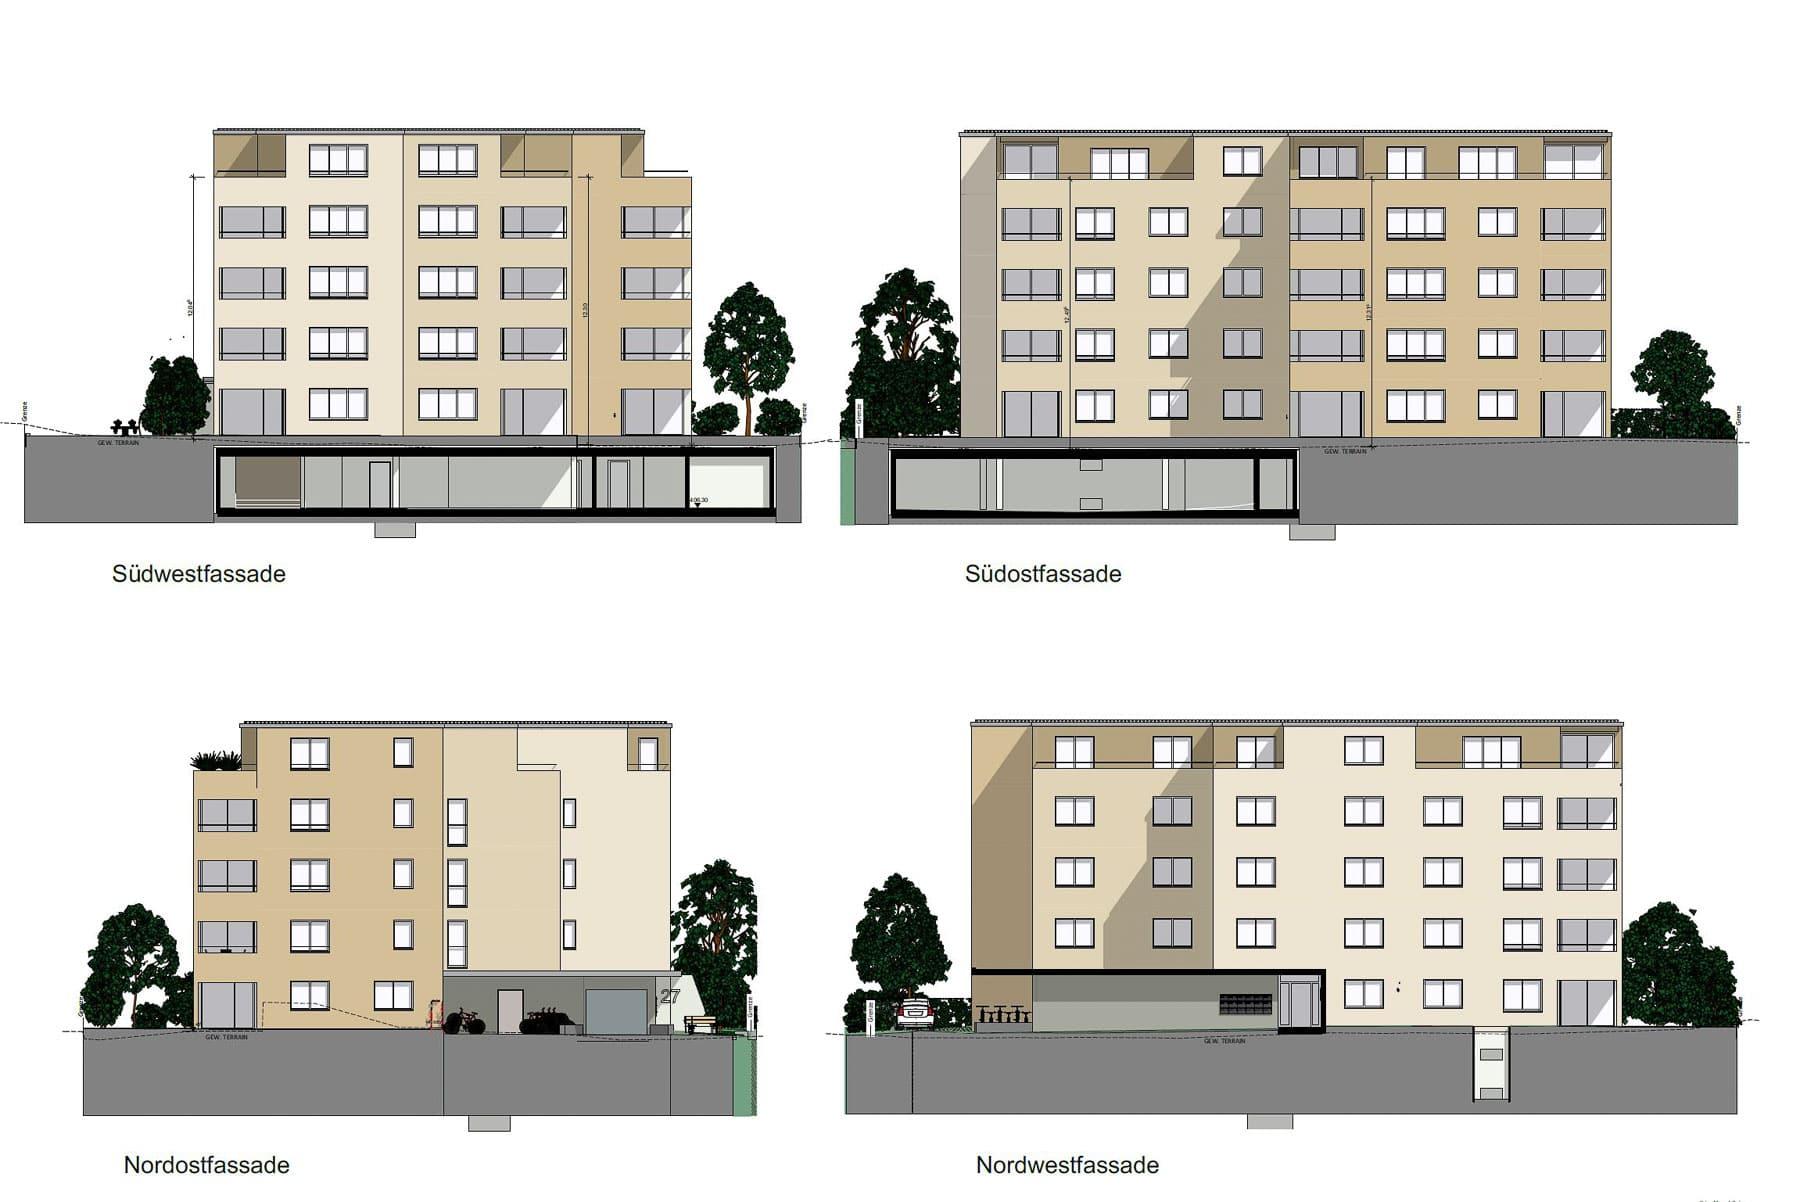 06-Fassaden-bearbeitet